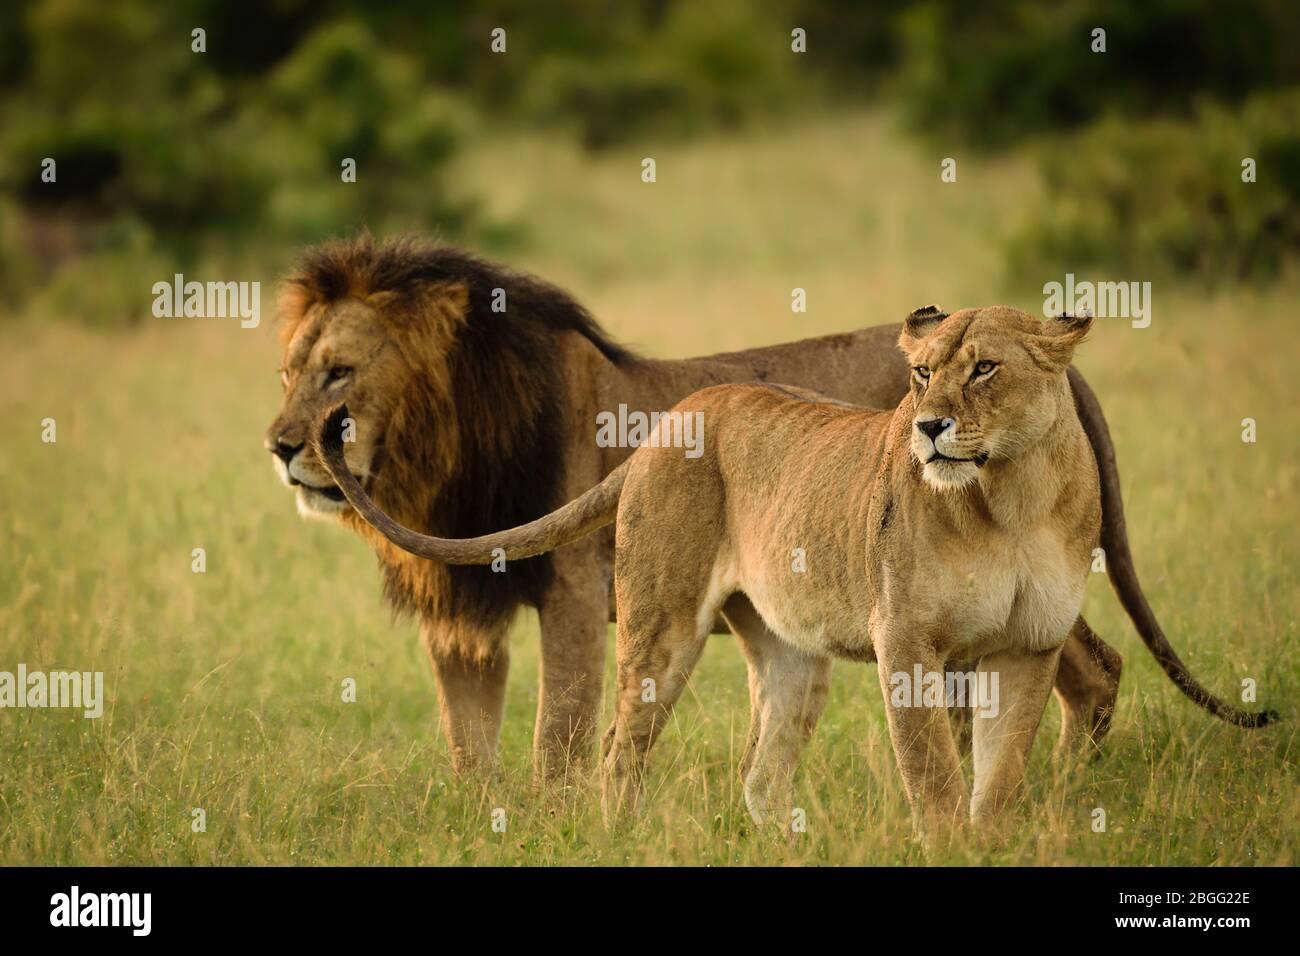 Pareja de leones en Maasai Mara, Kenia Foto de stock